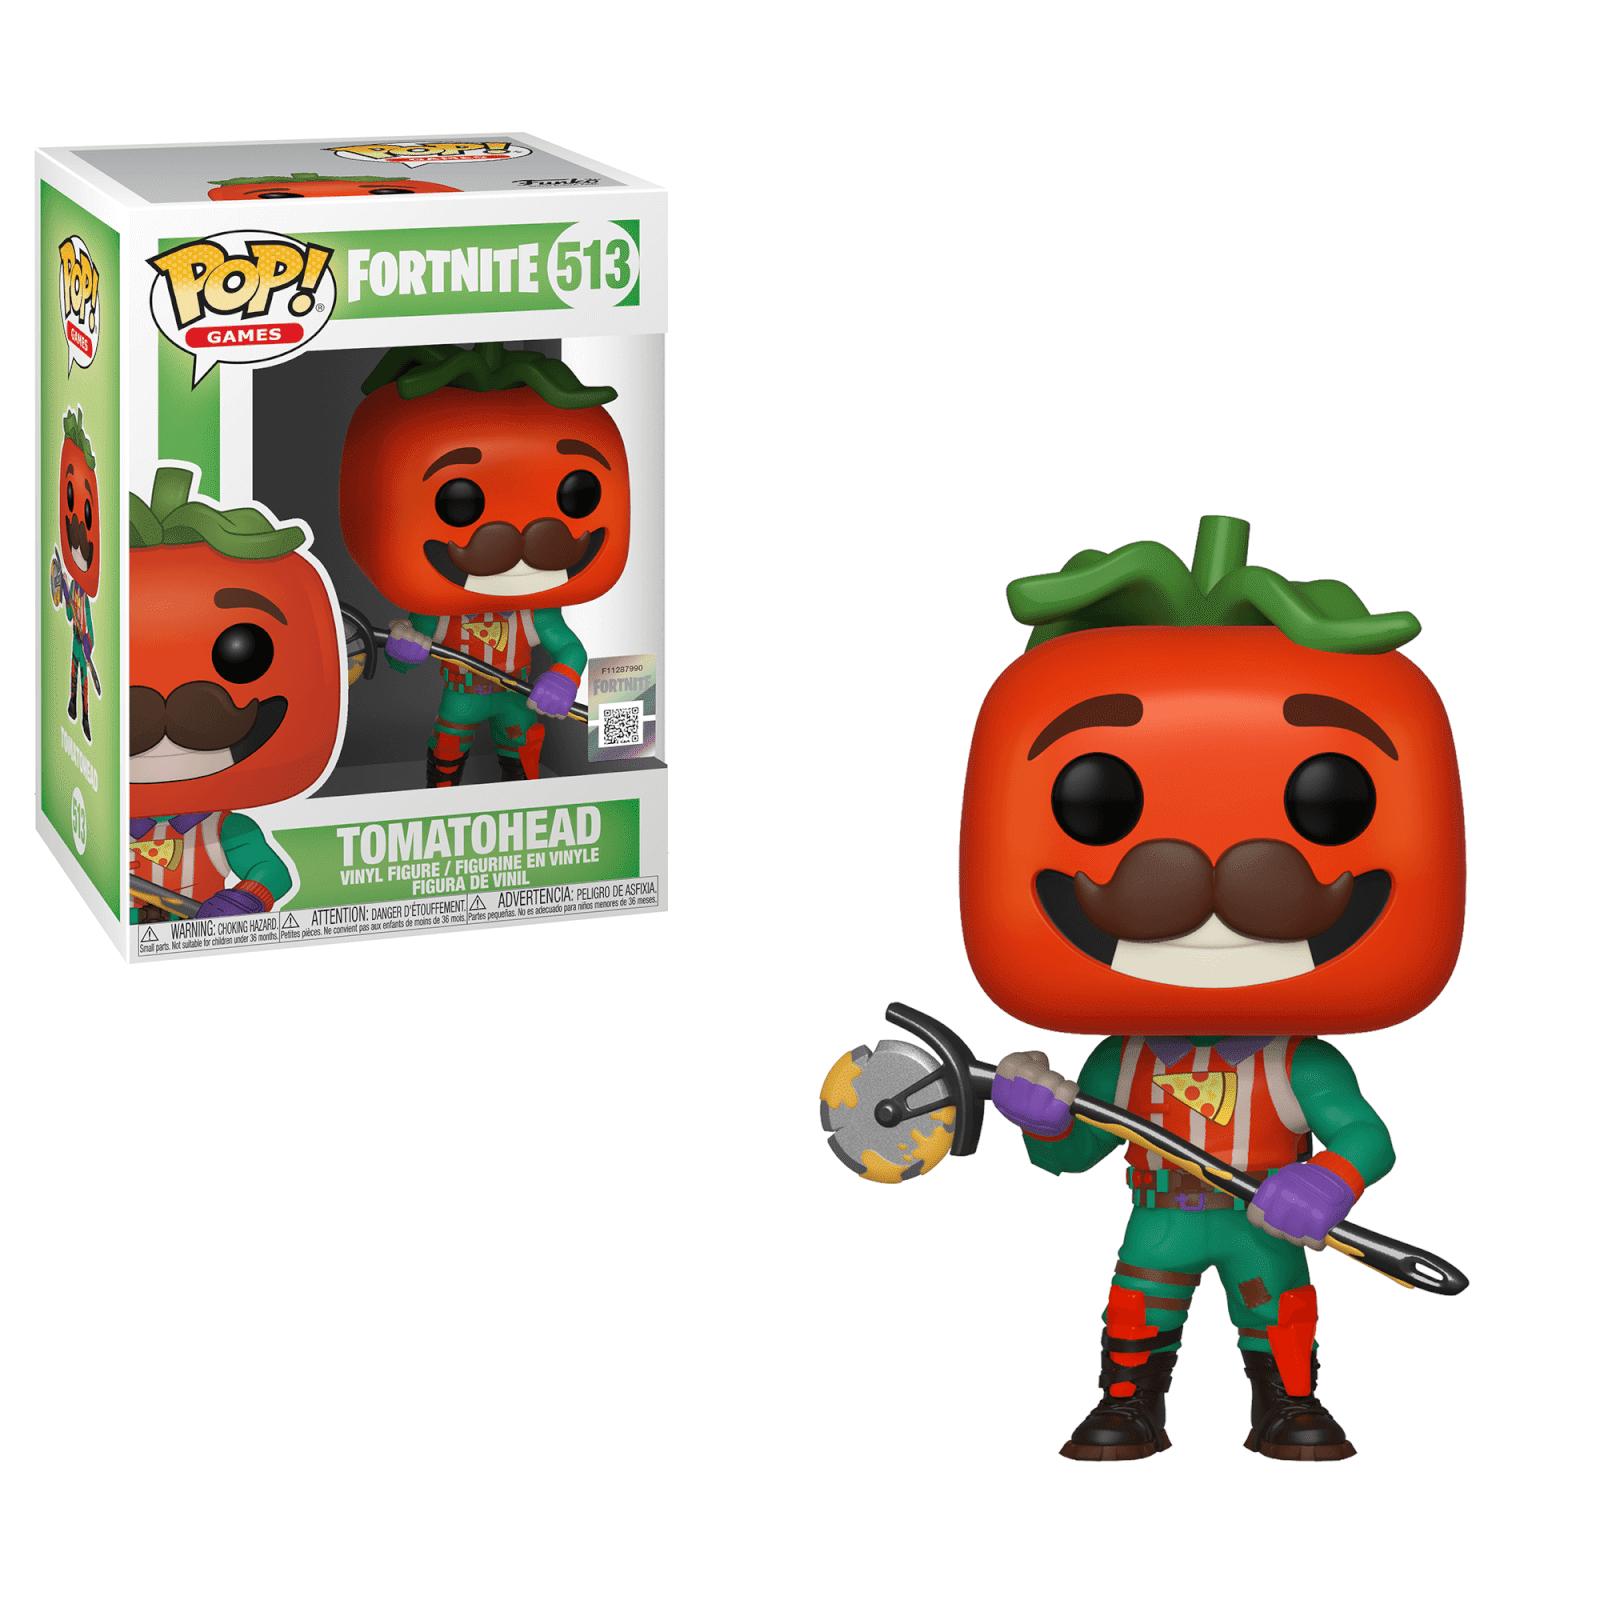 Pop! Vinyl Figurine Pop! Tomatohead - Fortnite